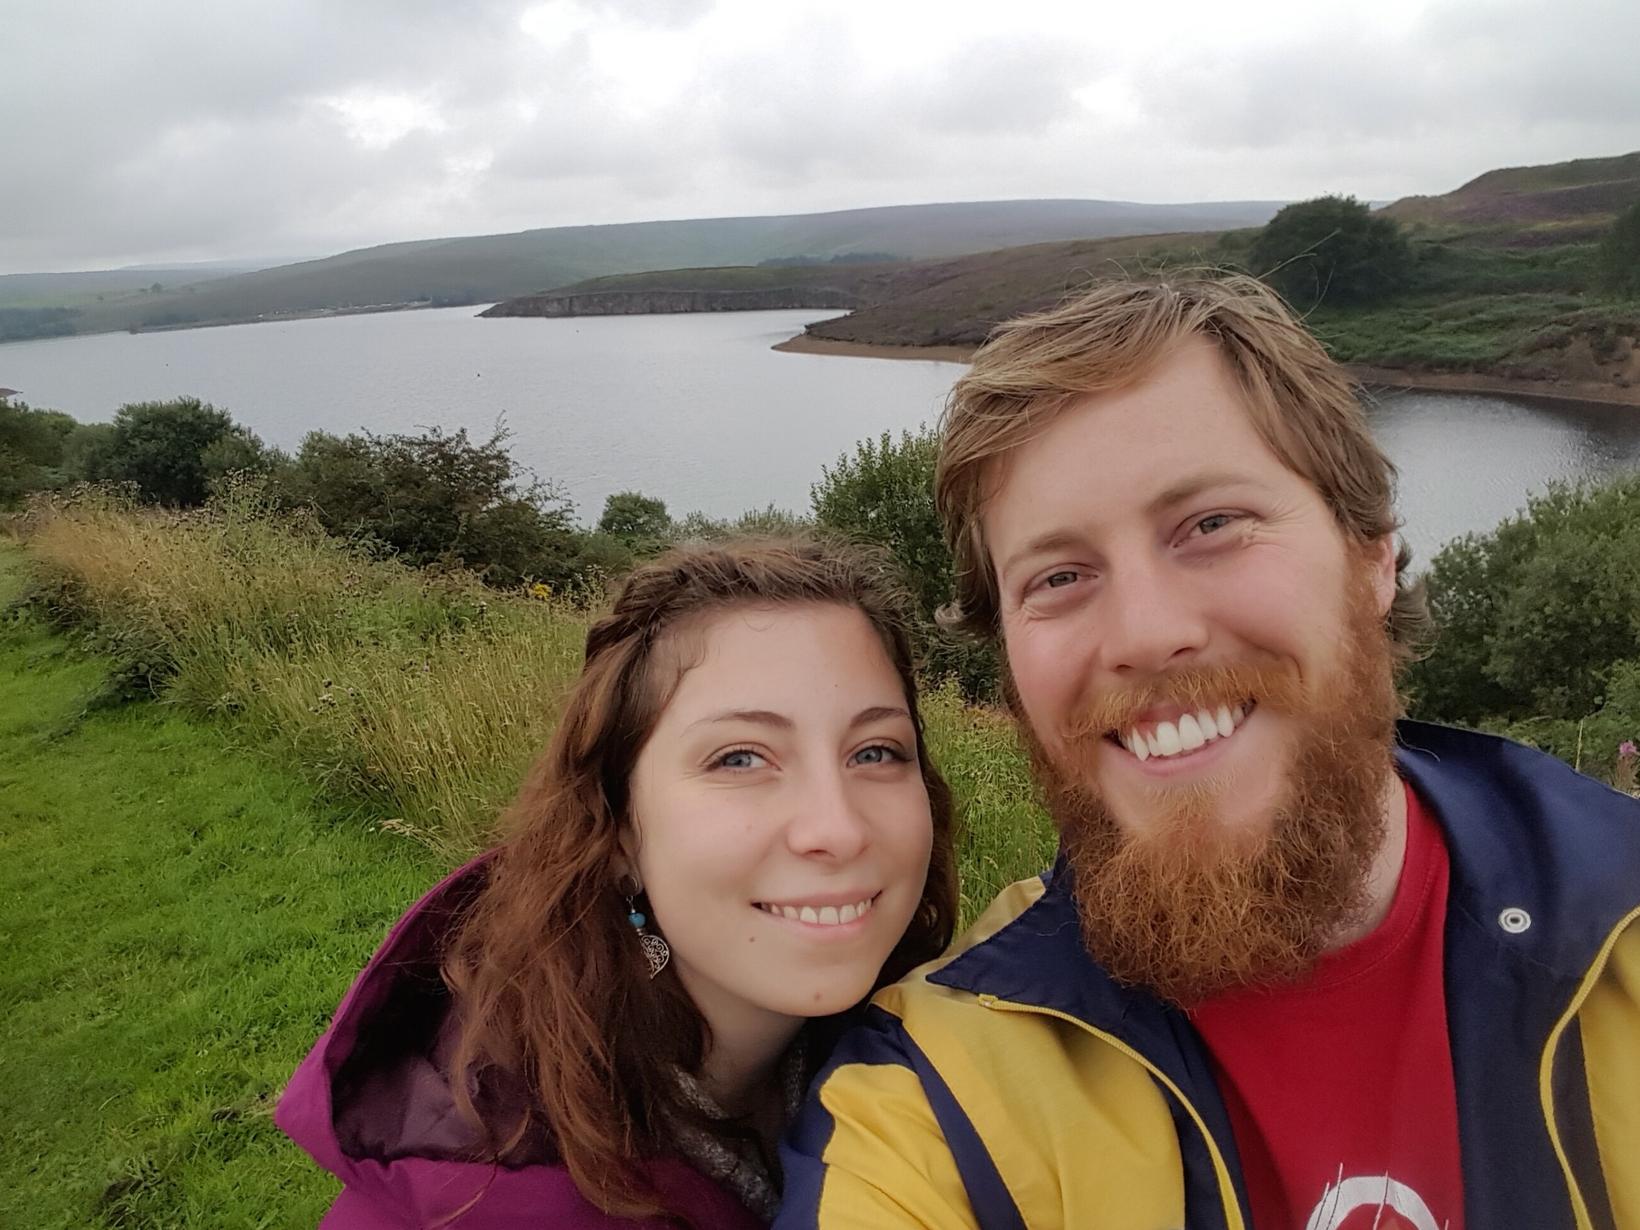 Susannah & Anthony from London, United Kingdom